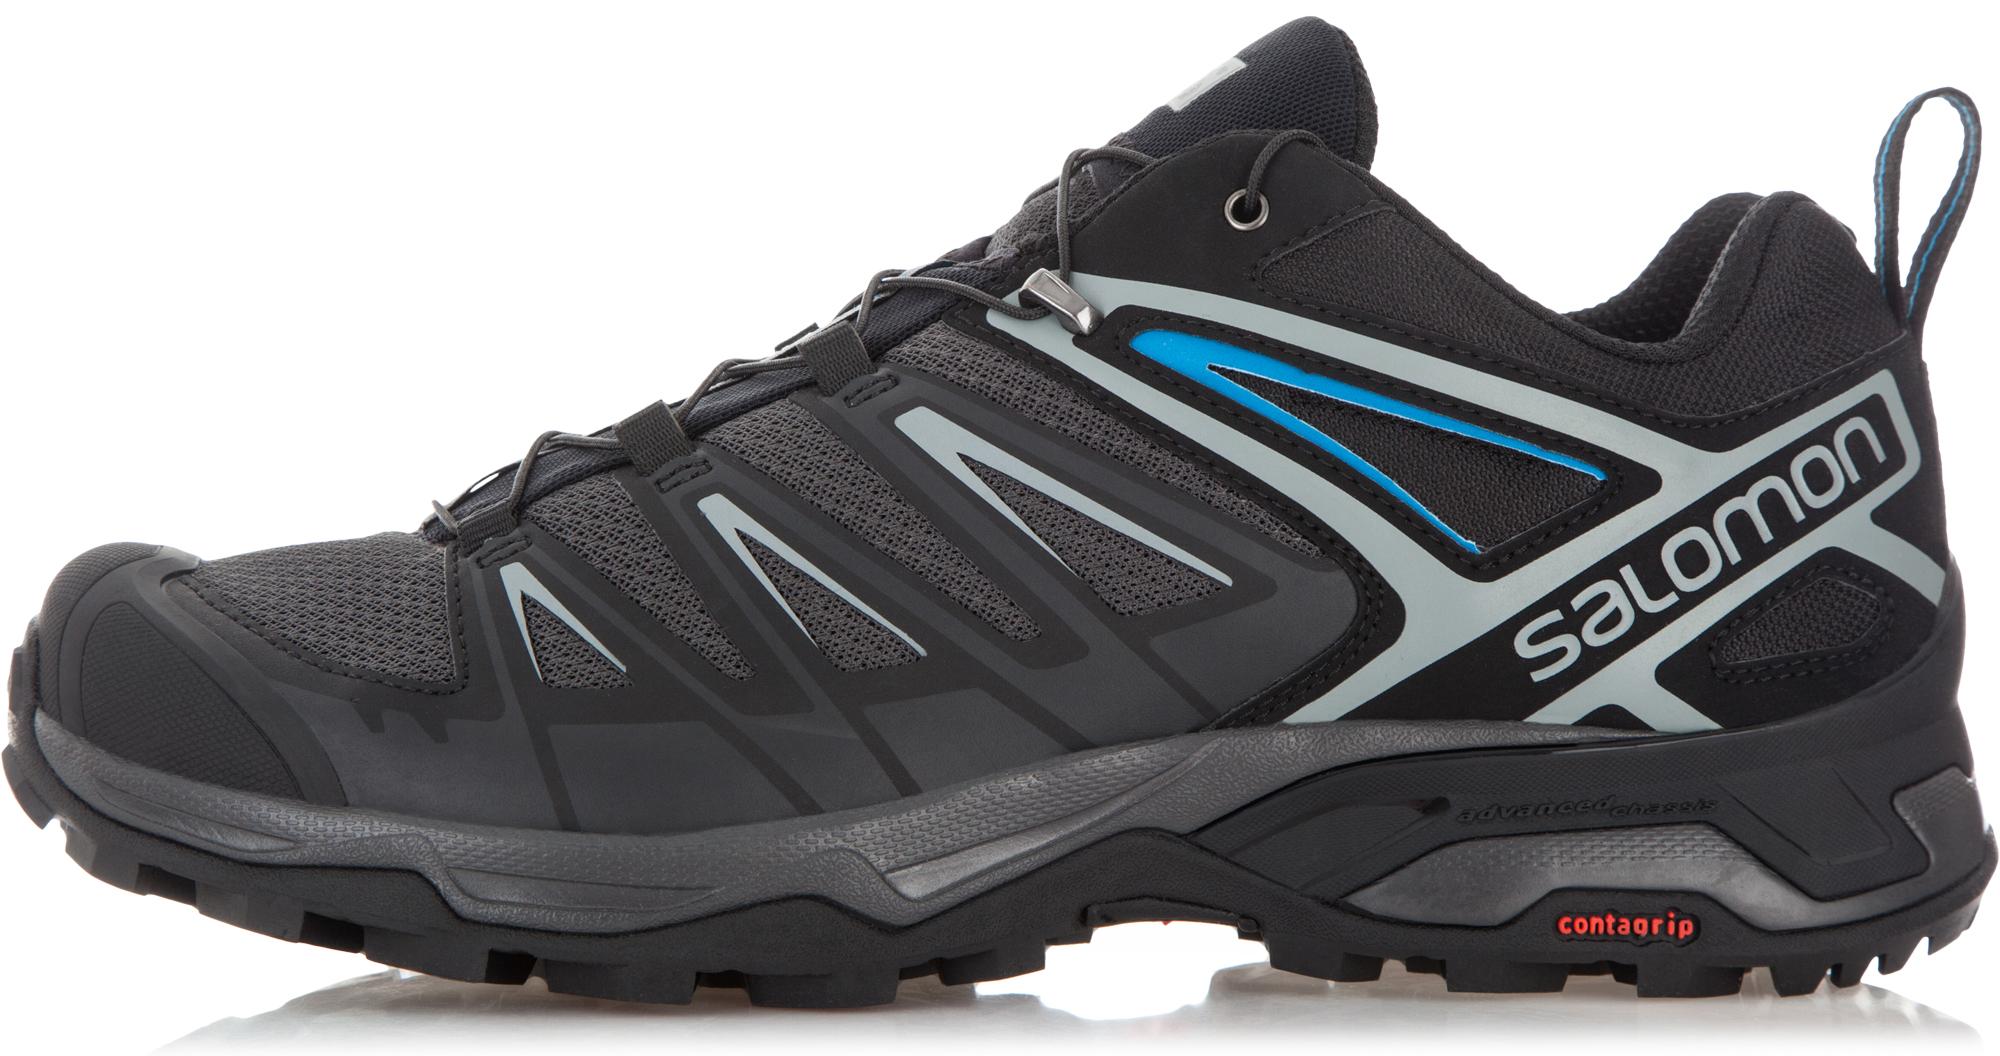 Salomon Полуботинки мужские Salomon X Ultra 3, размер 44 salomon ботинки горнолыжные salomon x pro 110 размер 44